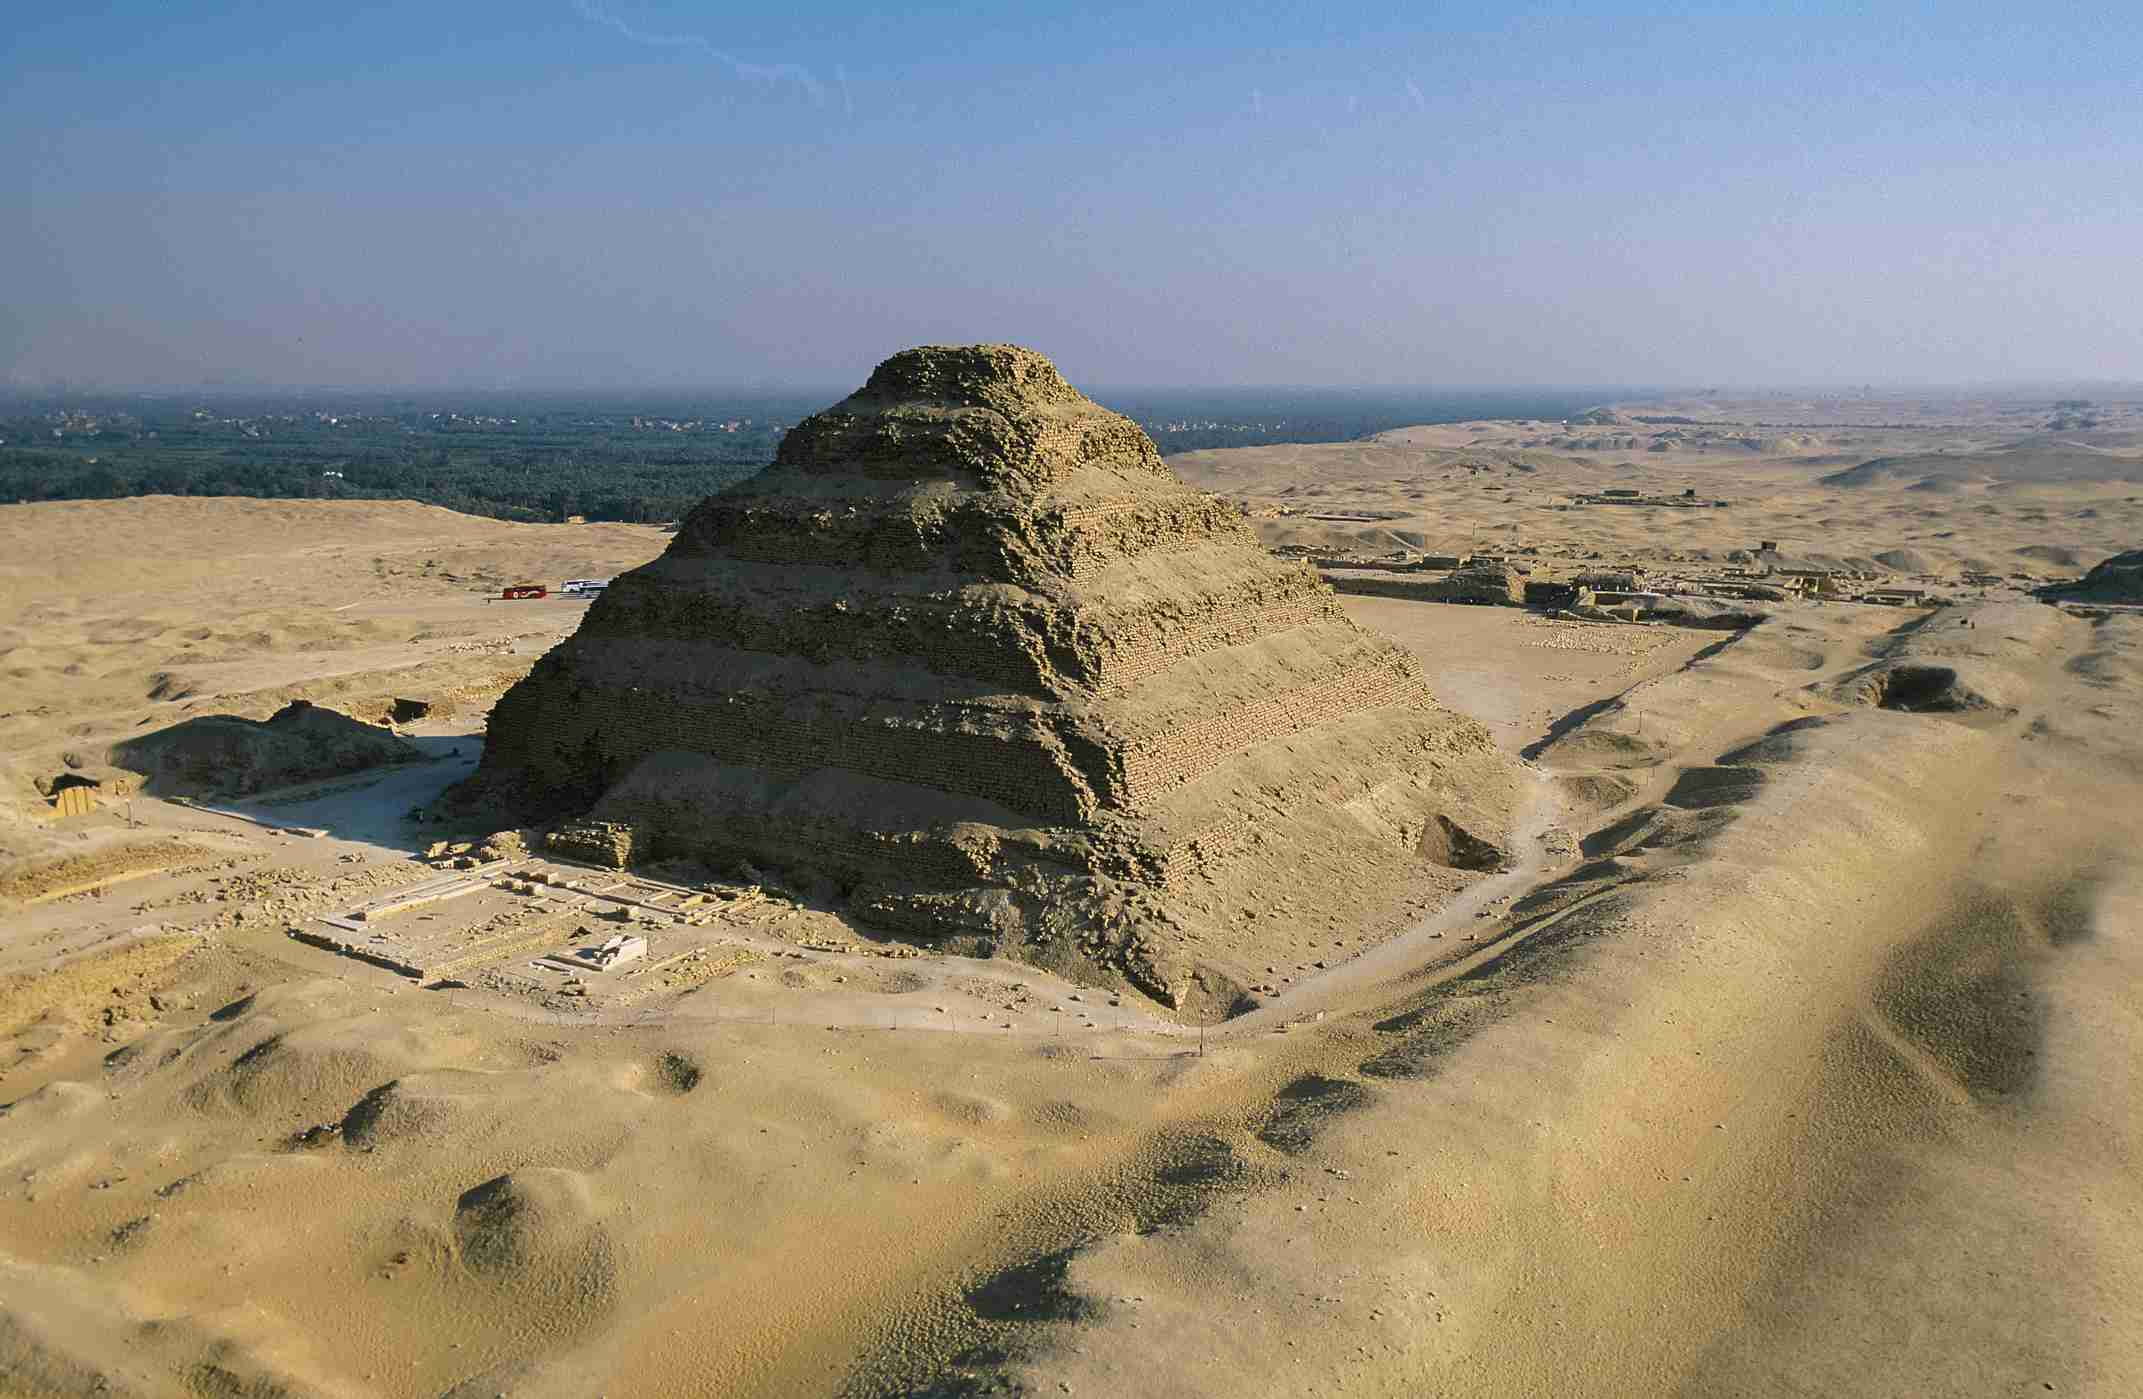 Djoser Pyramid in Saqqara, Egypt